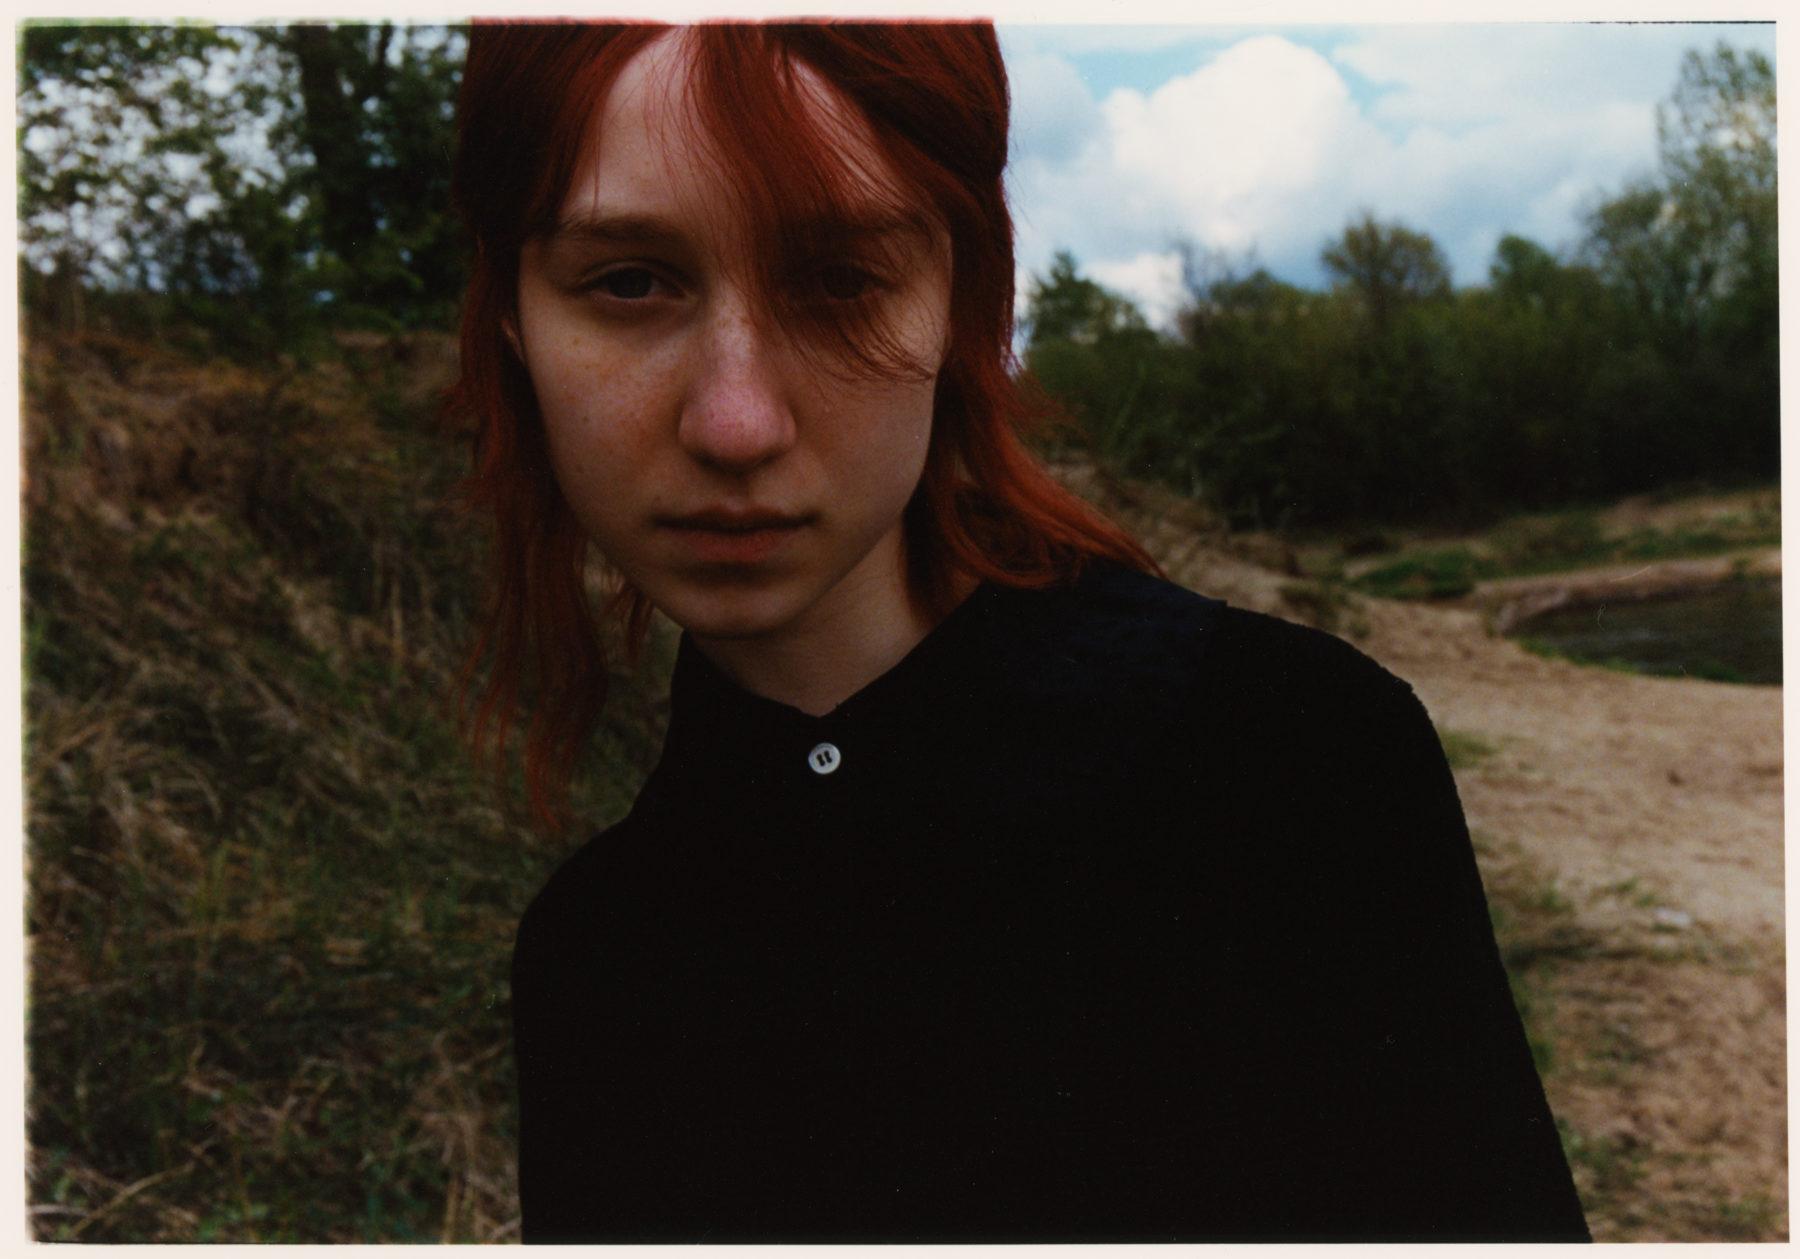 Editorial for Fräulein Magazine photographed by Yan Wasiuchnik